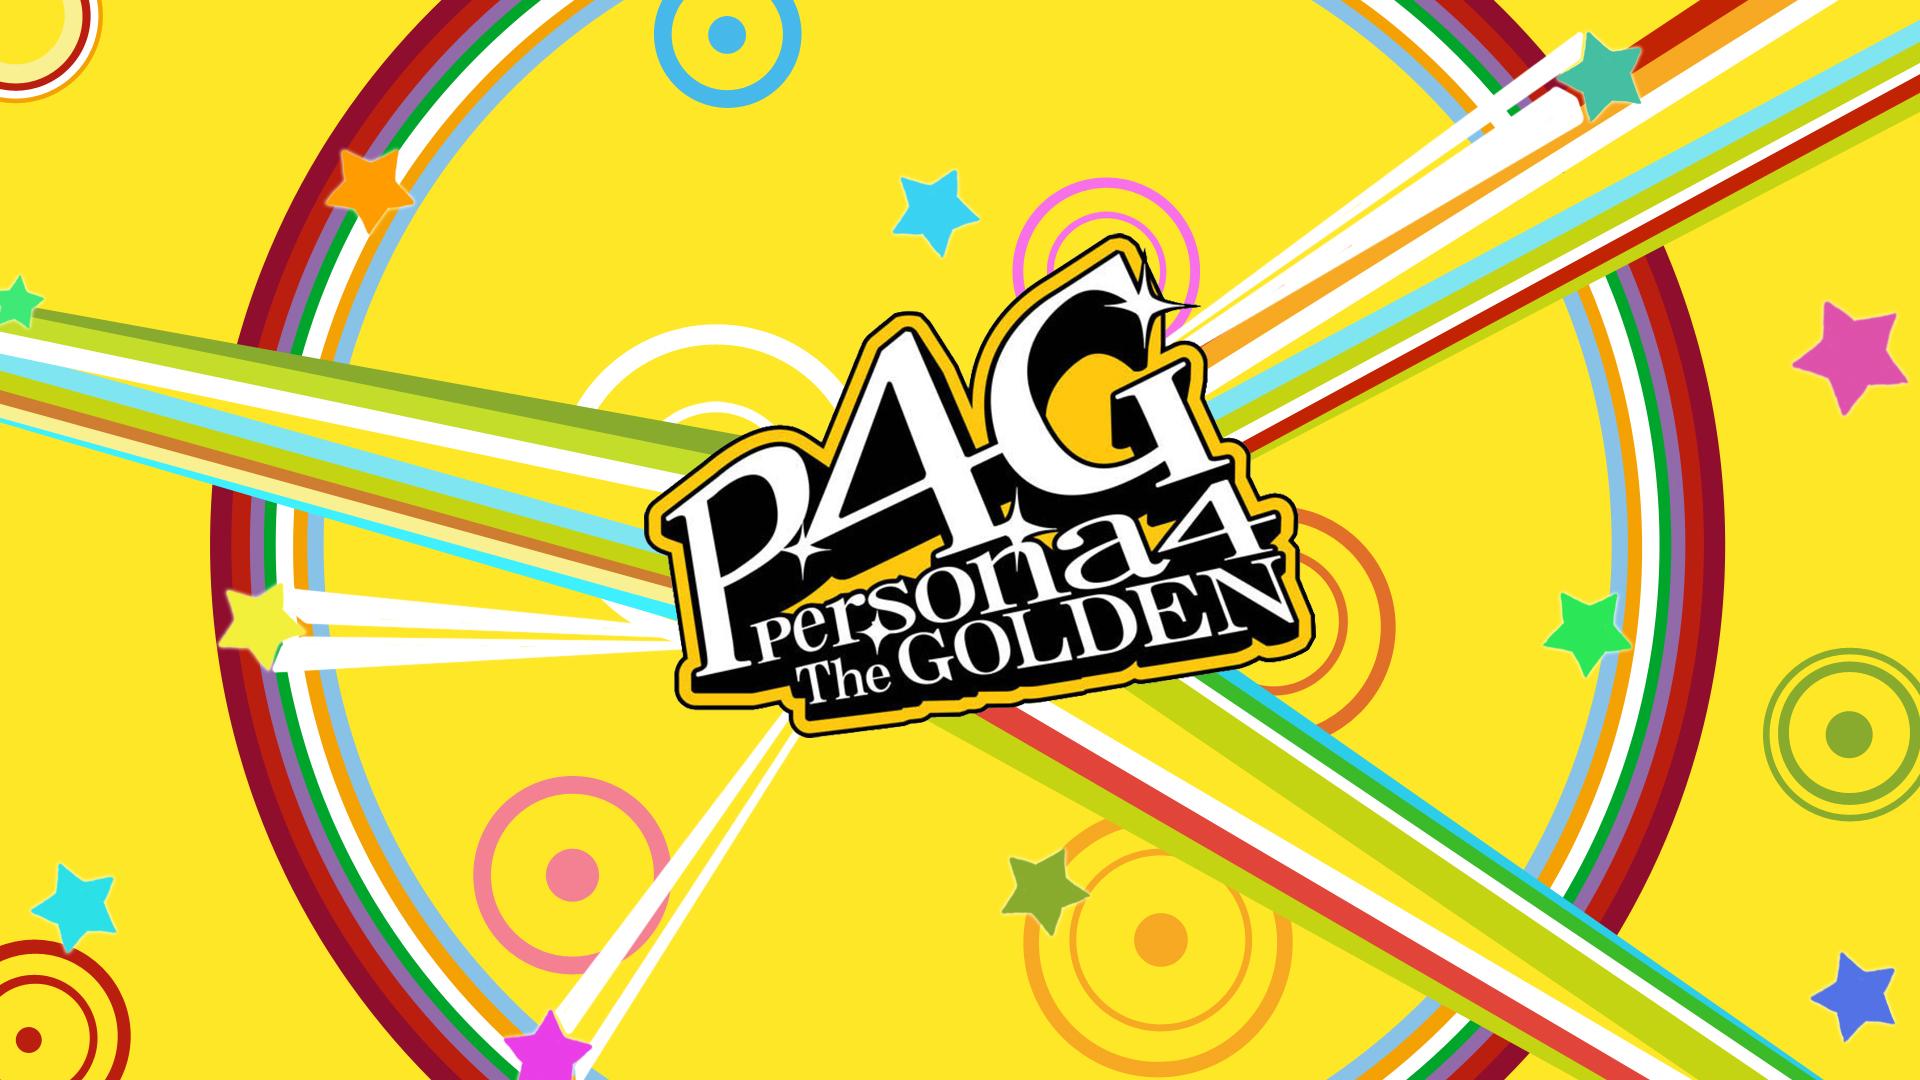 Persona 4 Golden вышла в Steam